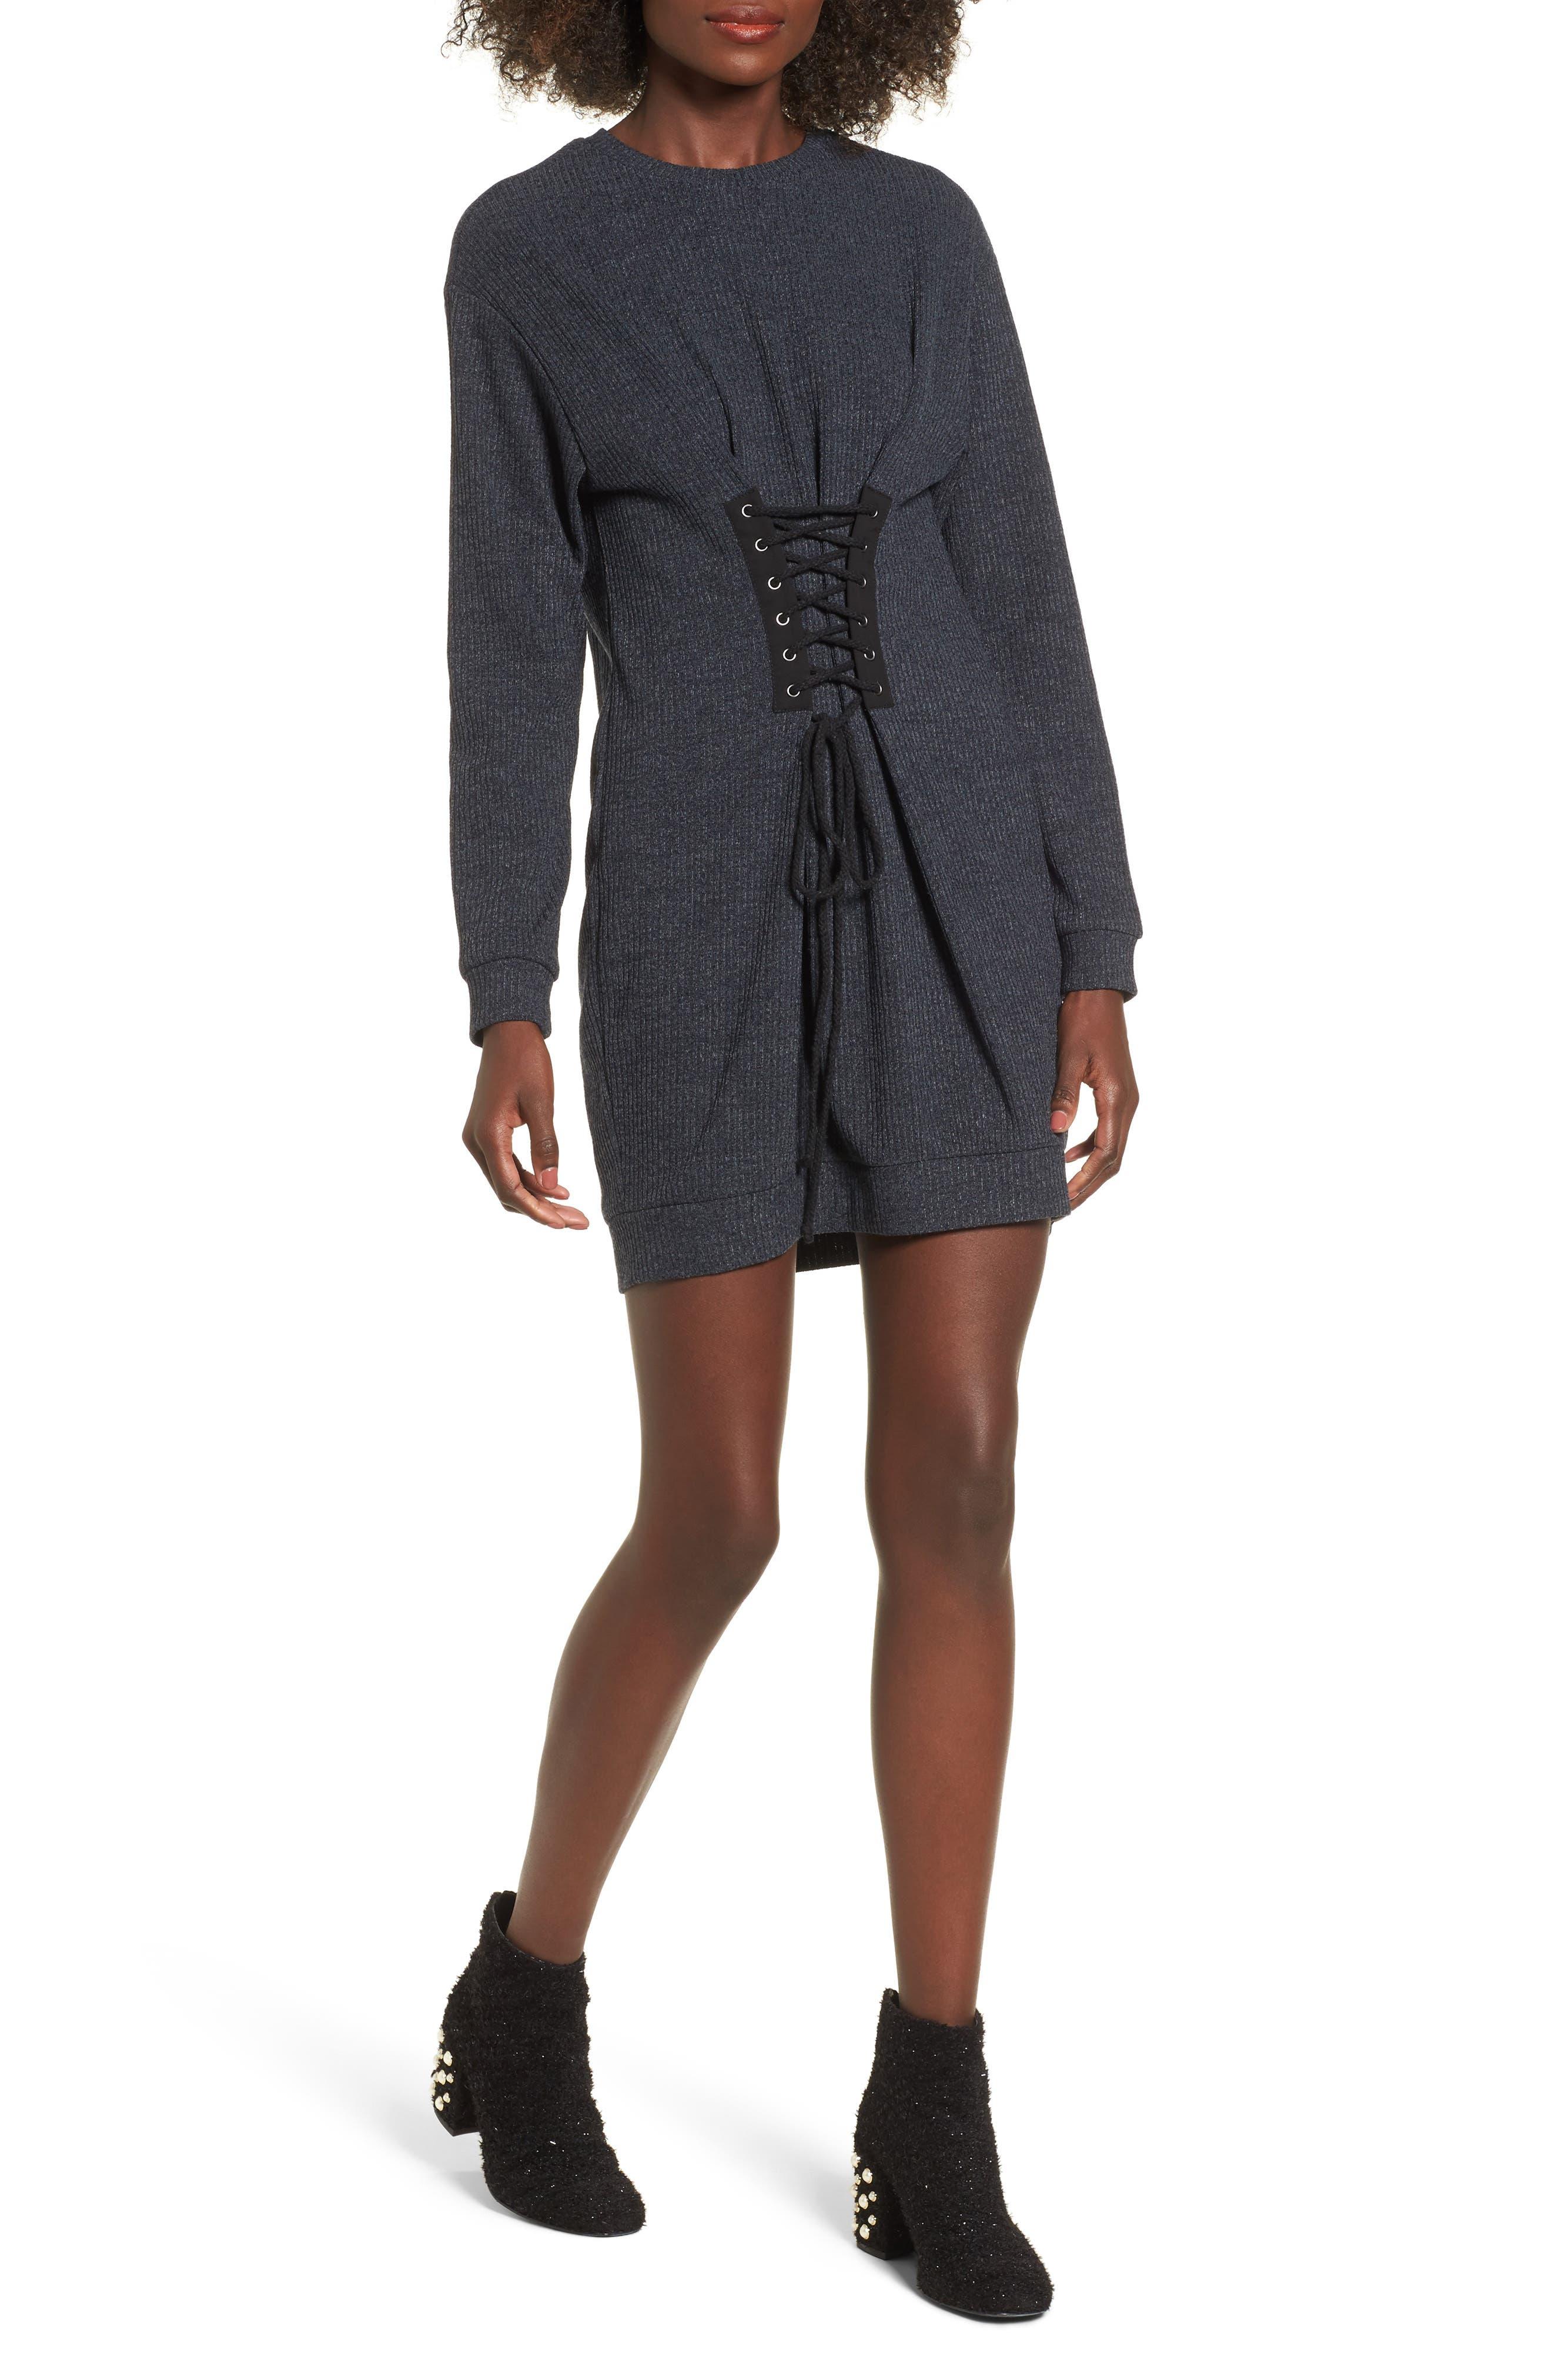 WAYF Corset Detail Sweatshirt Dress